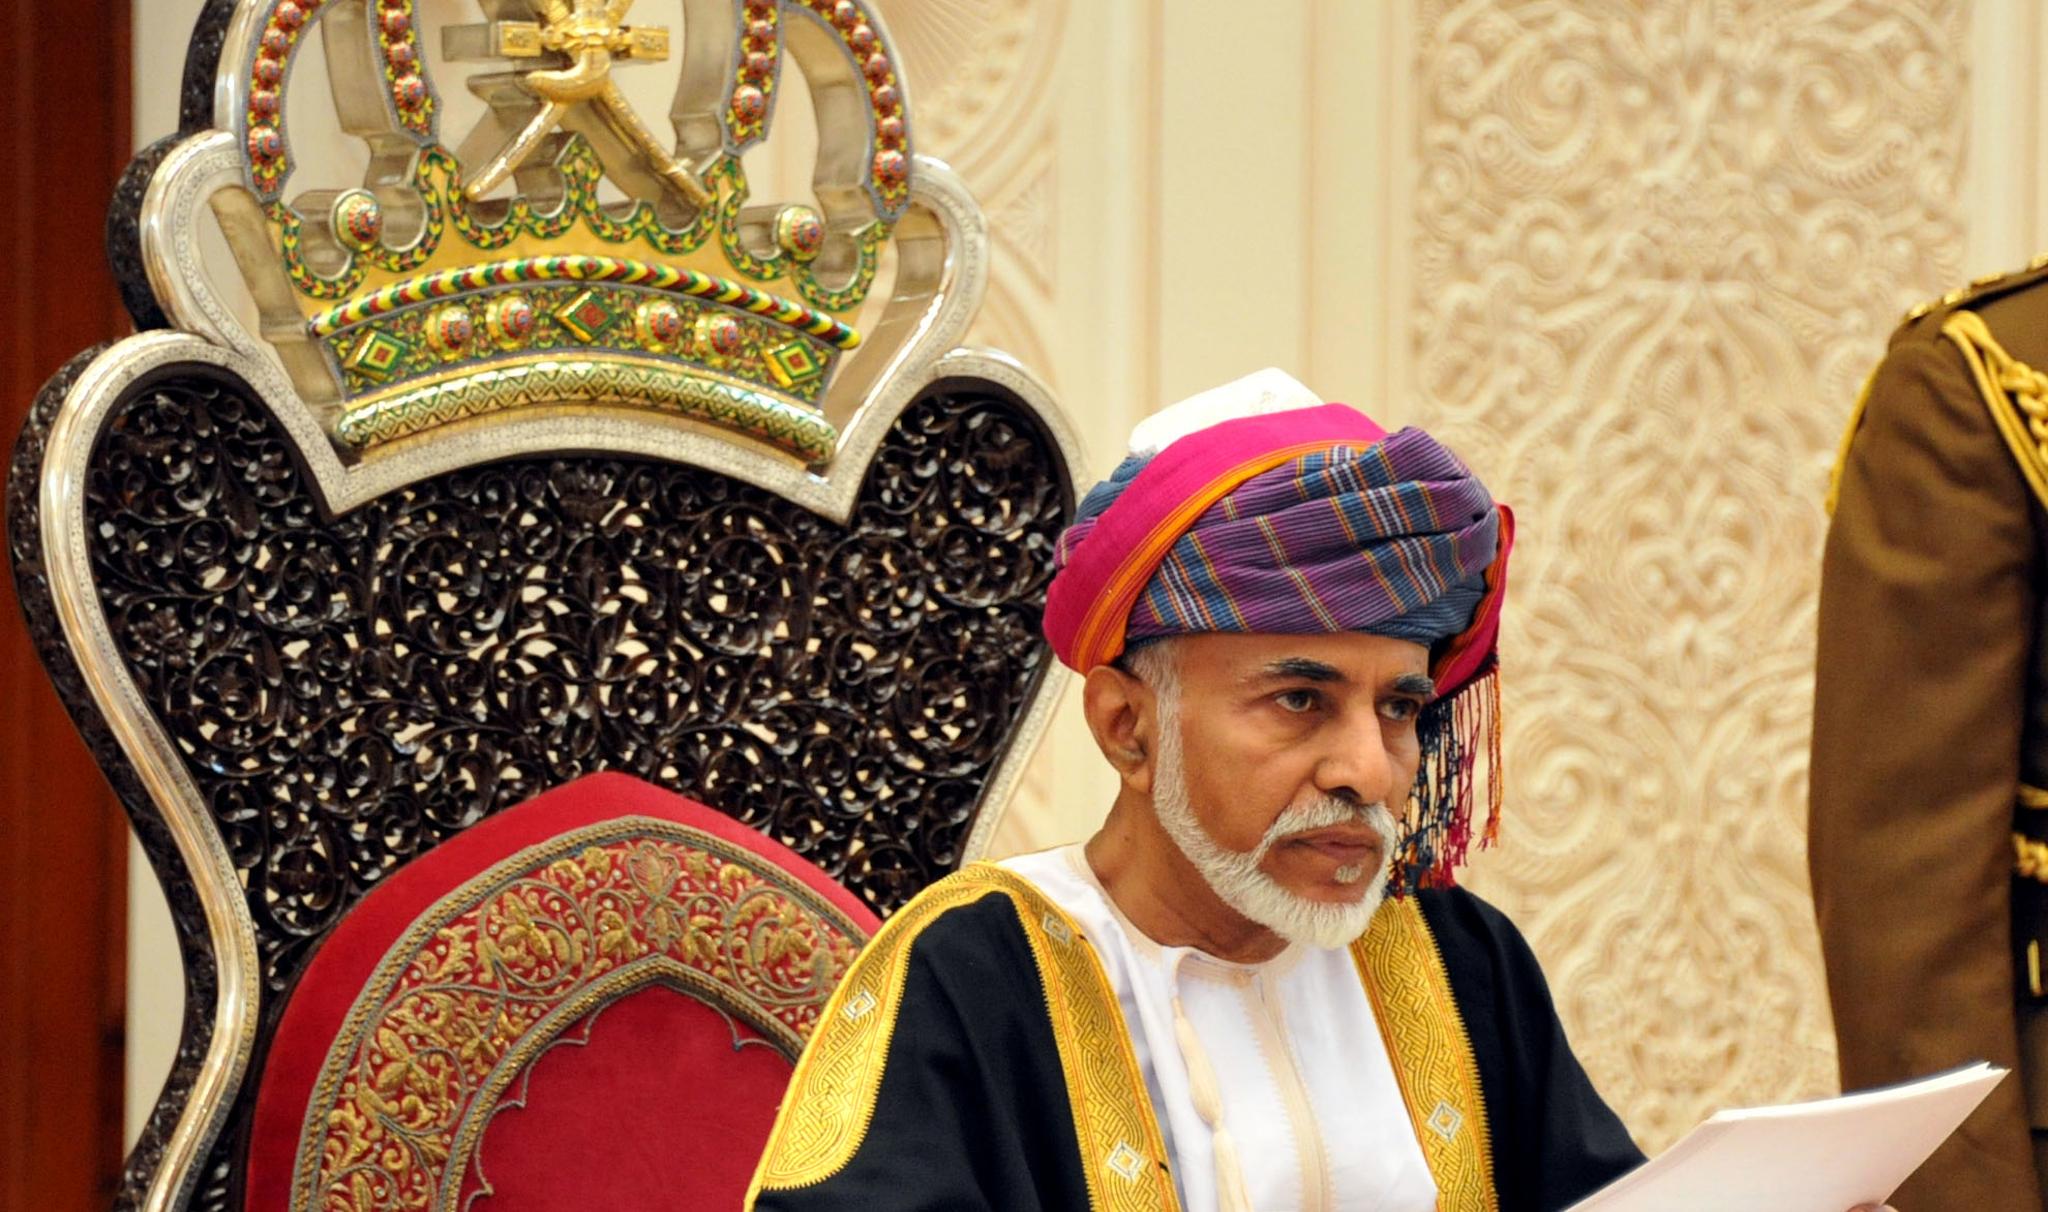 Sultan Qaboos bin Said Al Said (Photo: Oman News Agency)